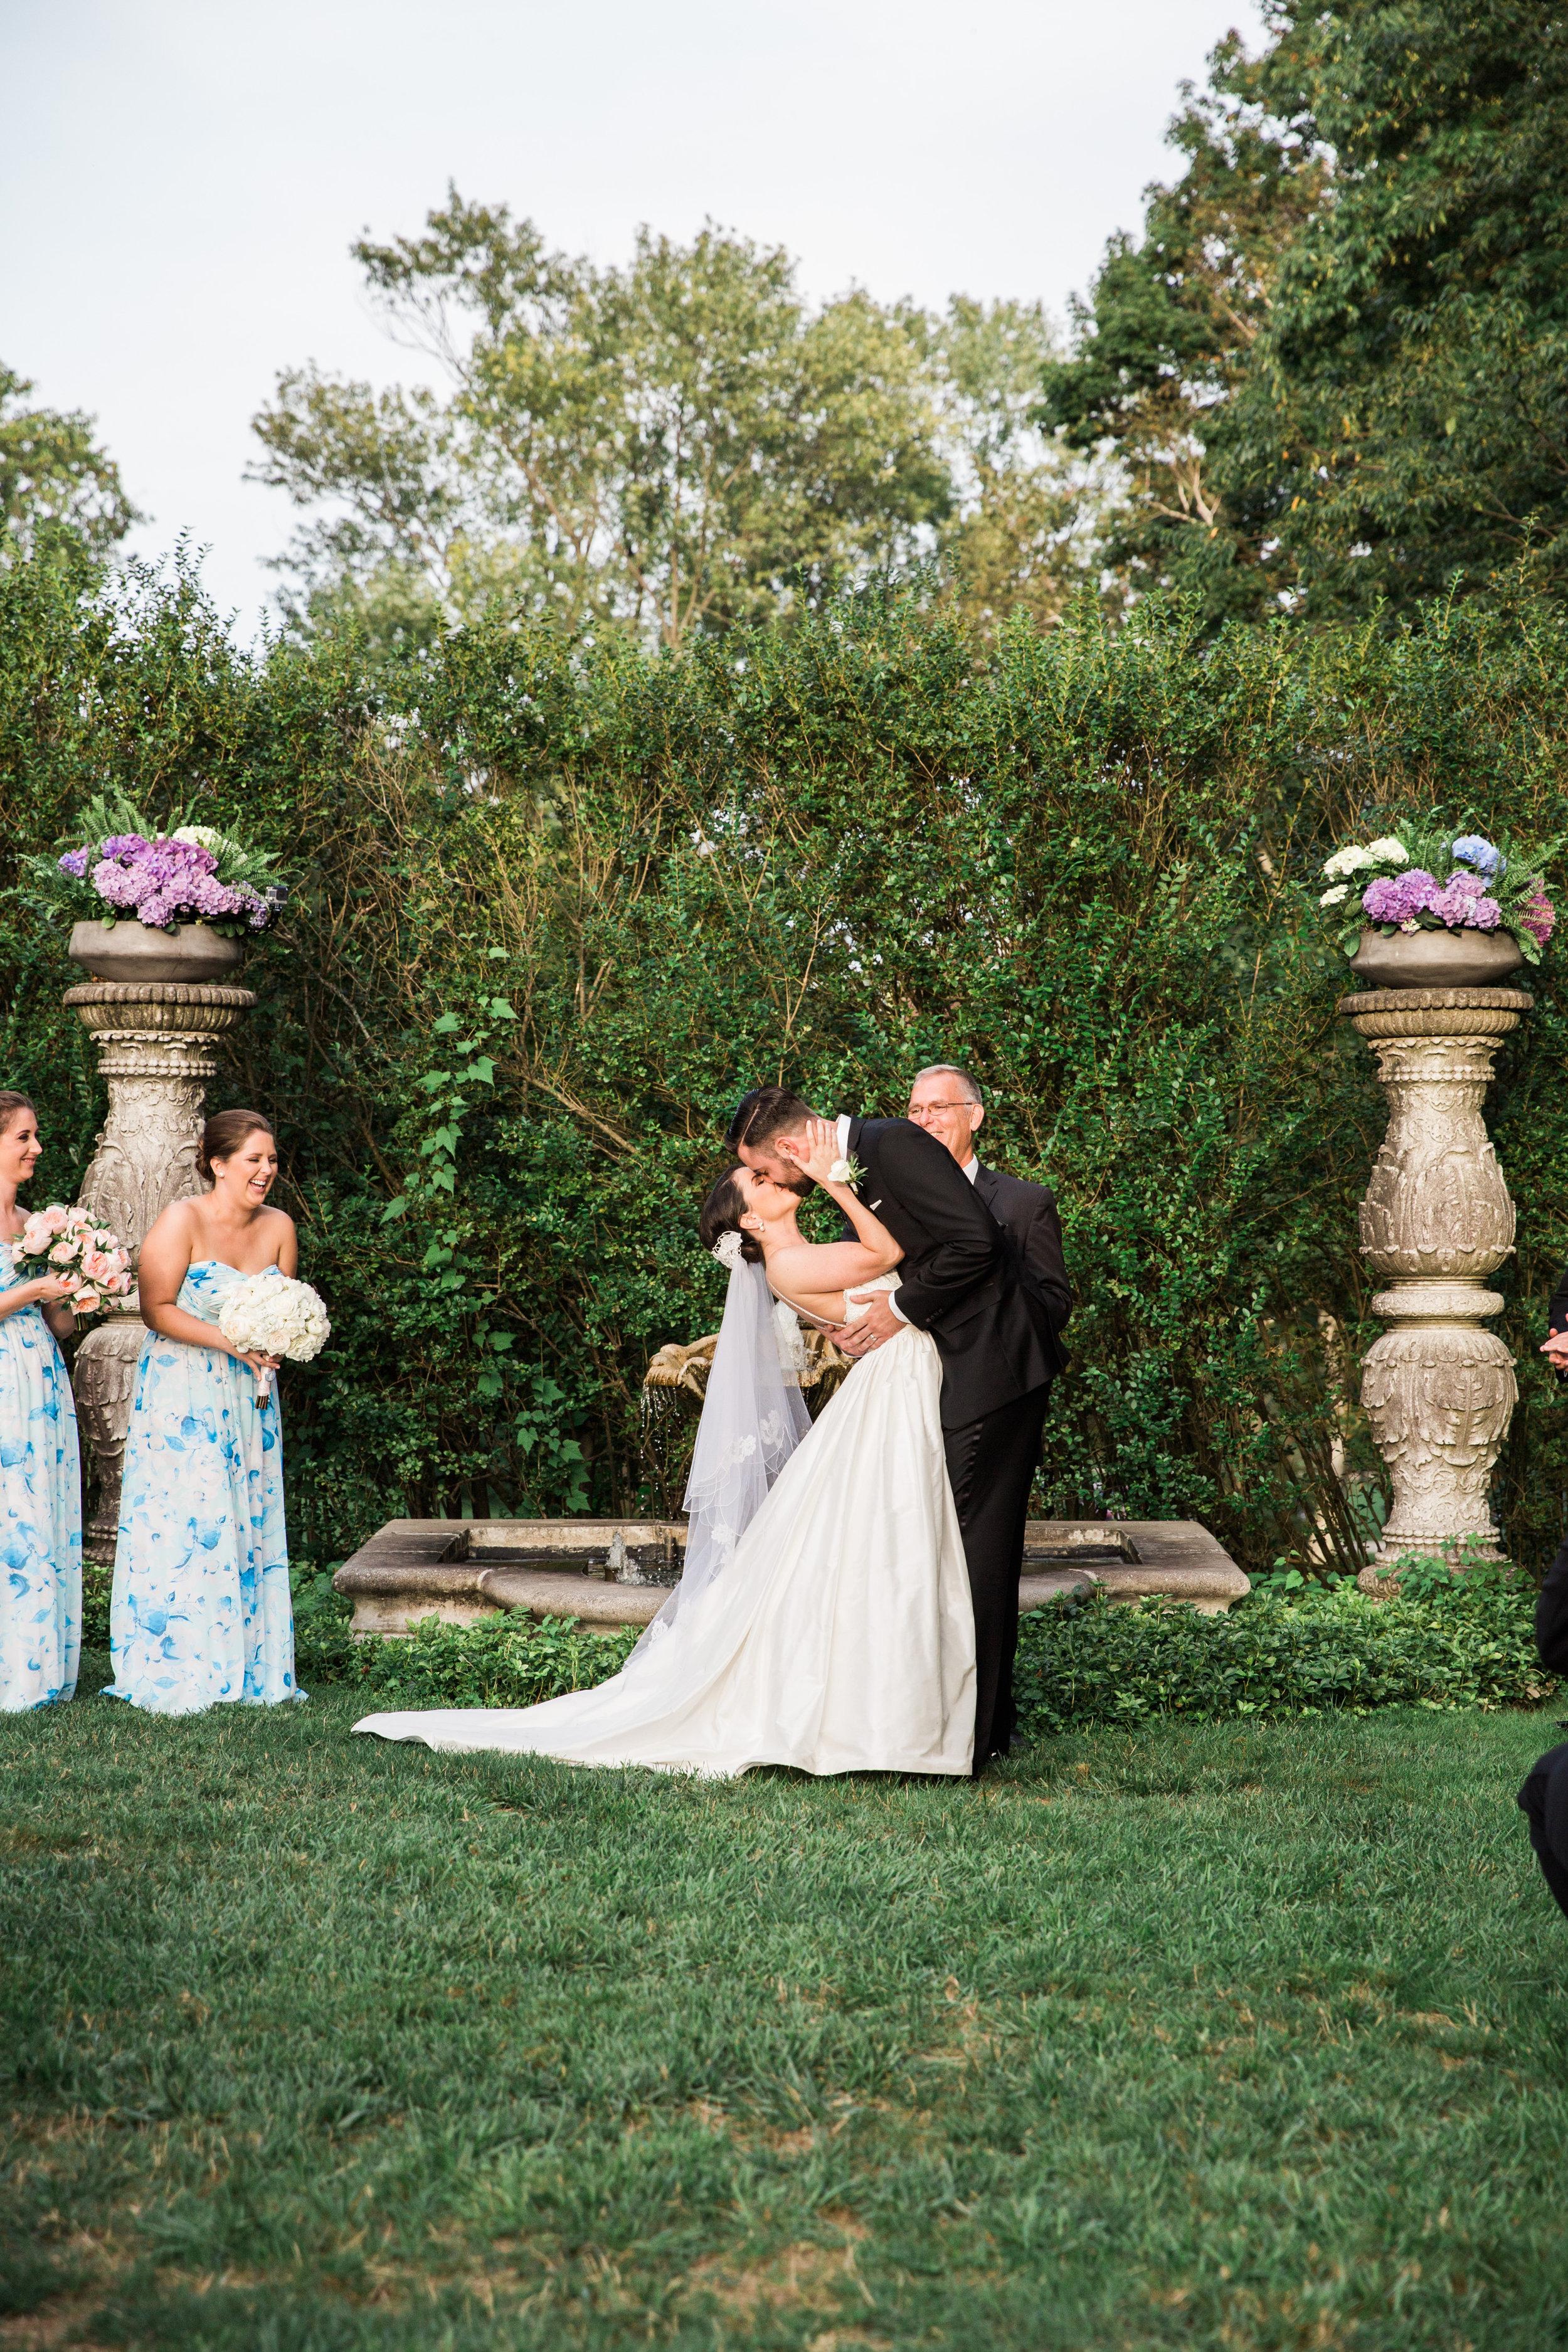 Evergreen-Museum-Balitmore-Maryland-Wedding-Black-Tie-Bride-031.jpg